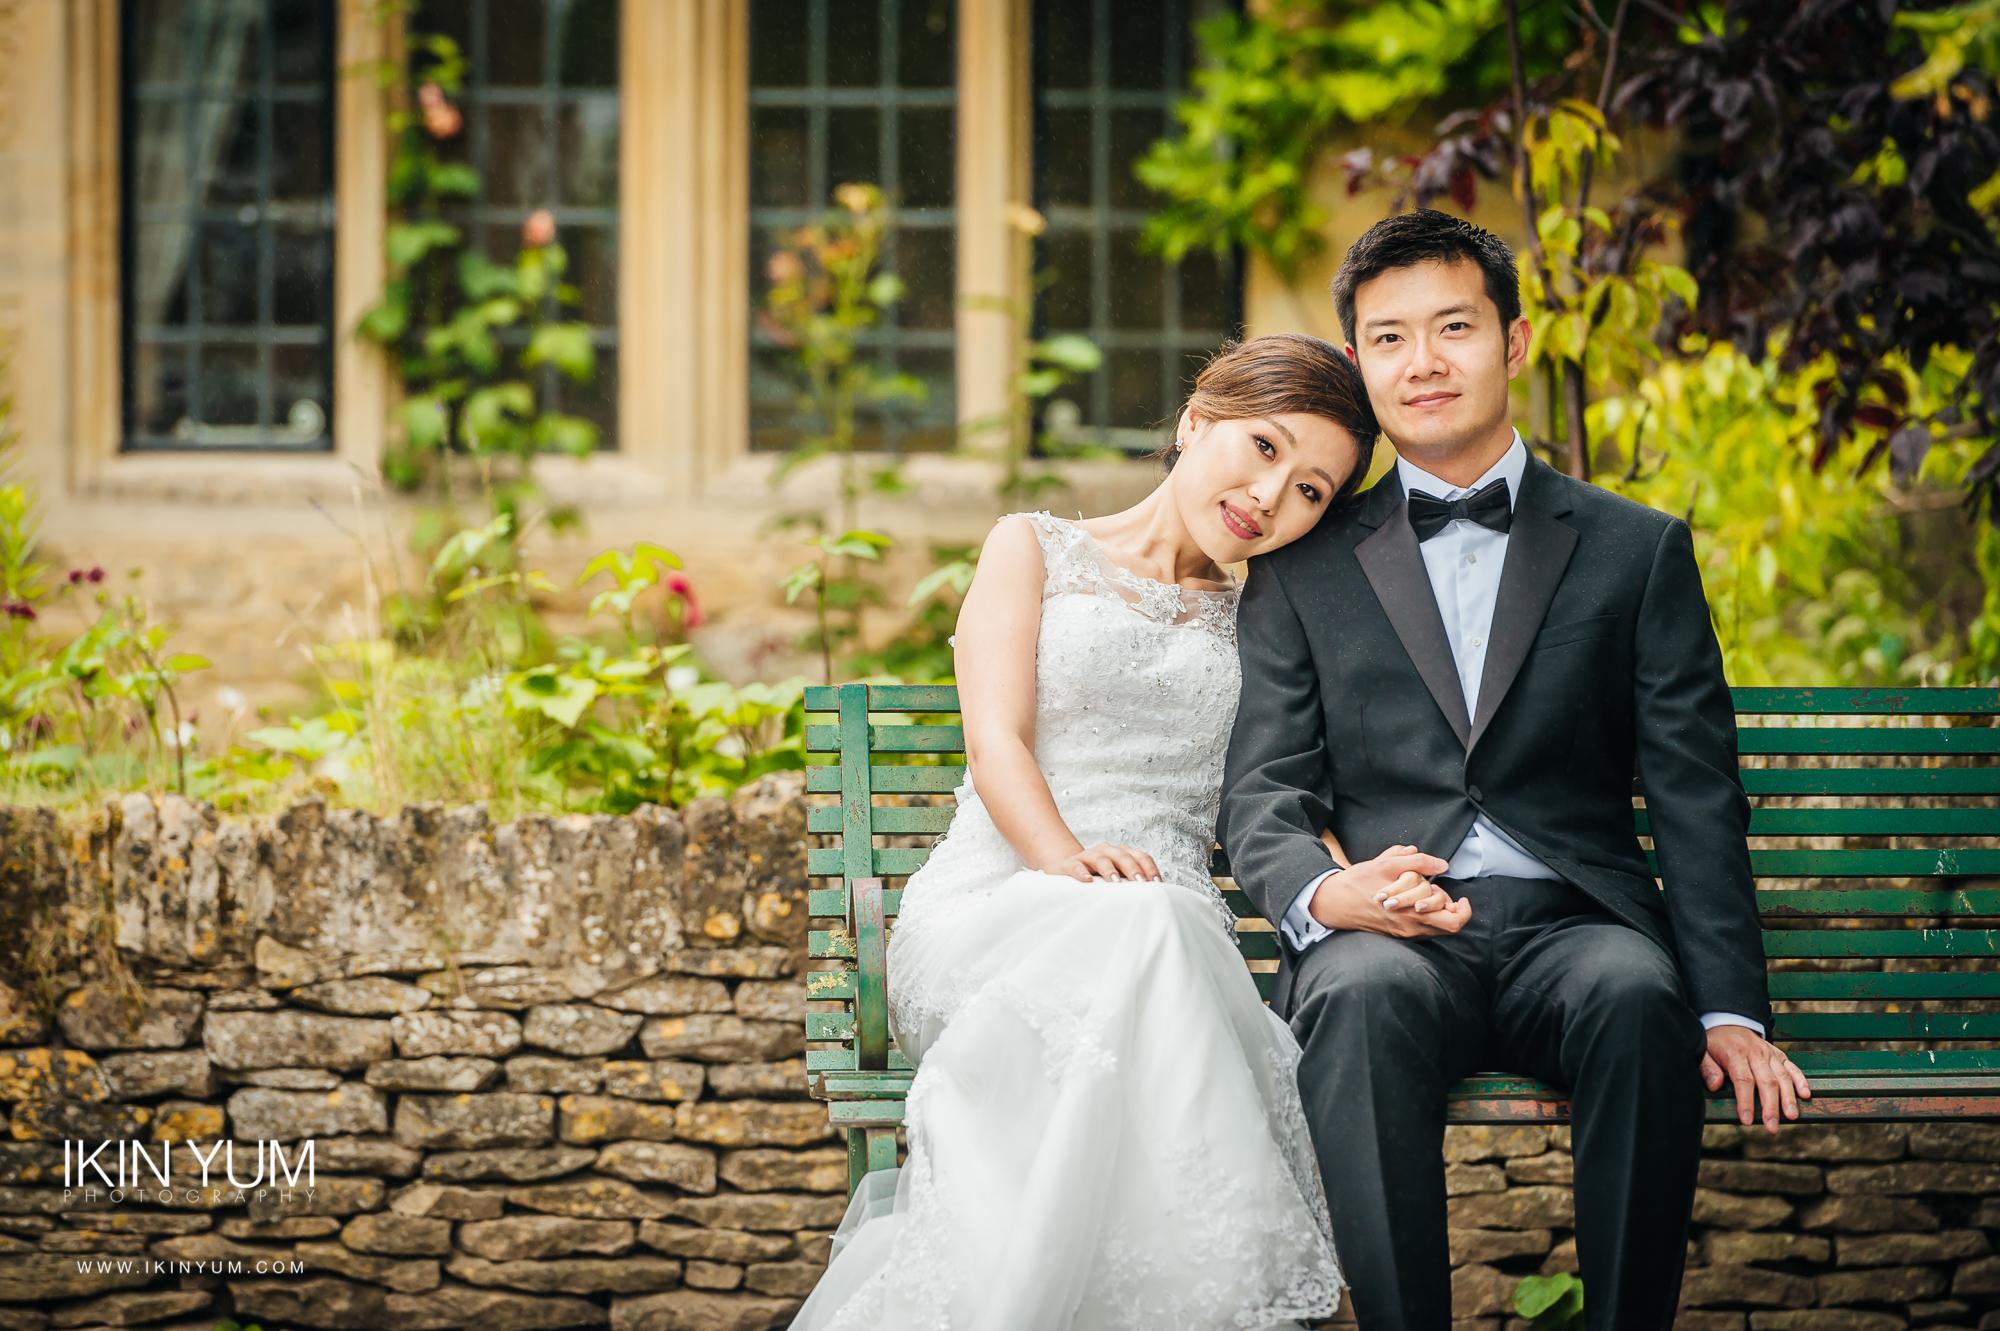 Carmen & Dennis Pre-Wedding Shoot - Ikin Yum Photography-005.jpg